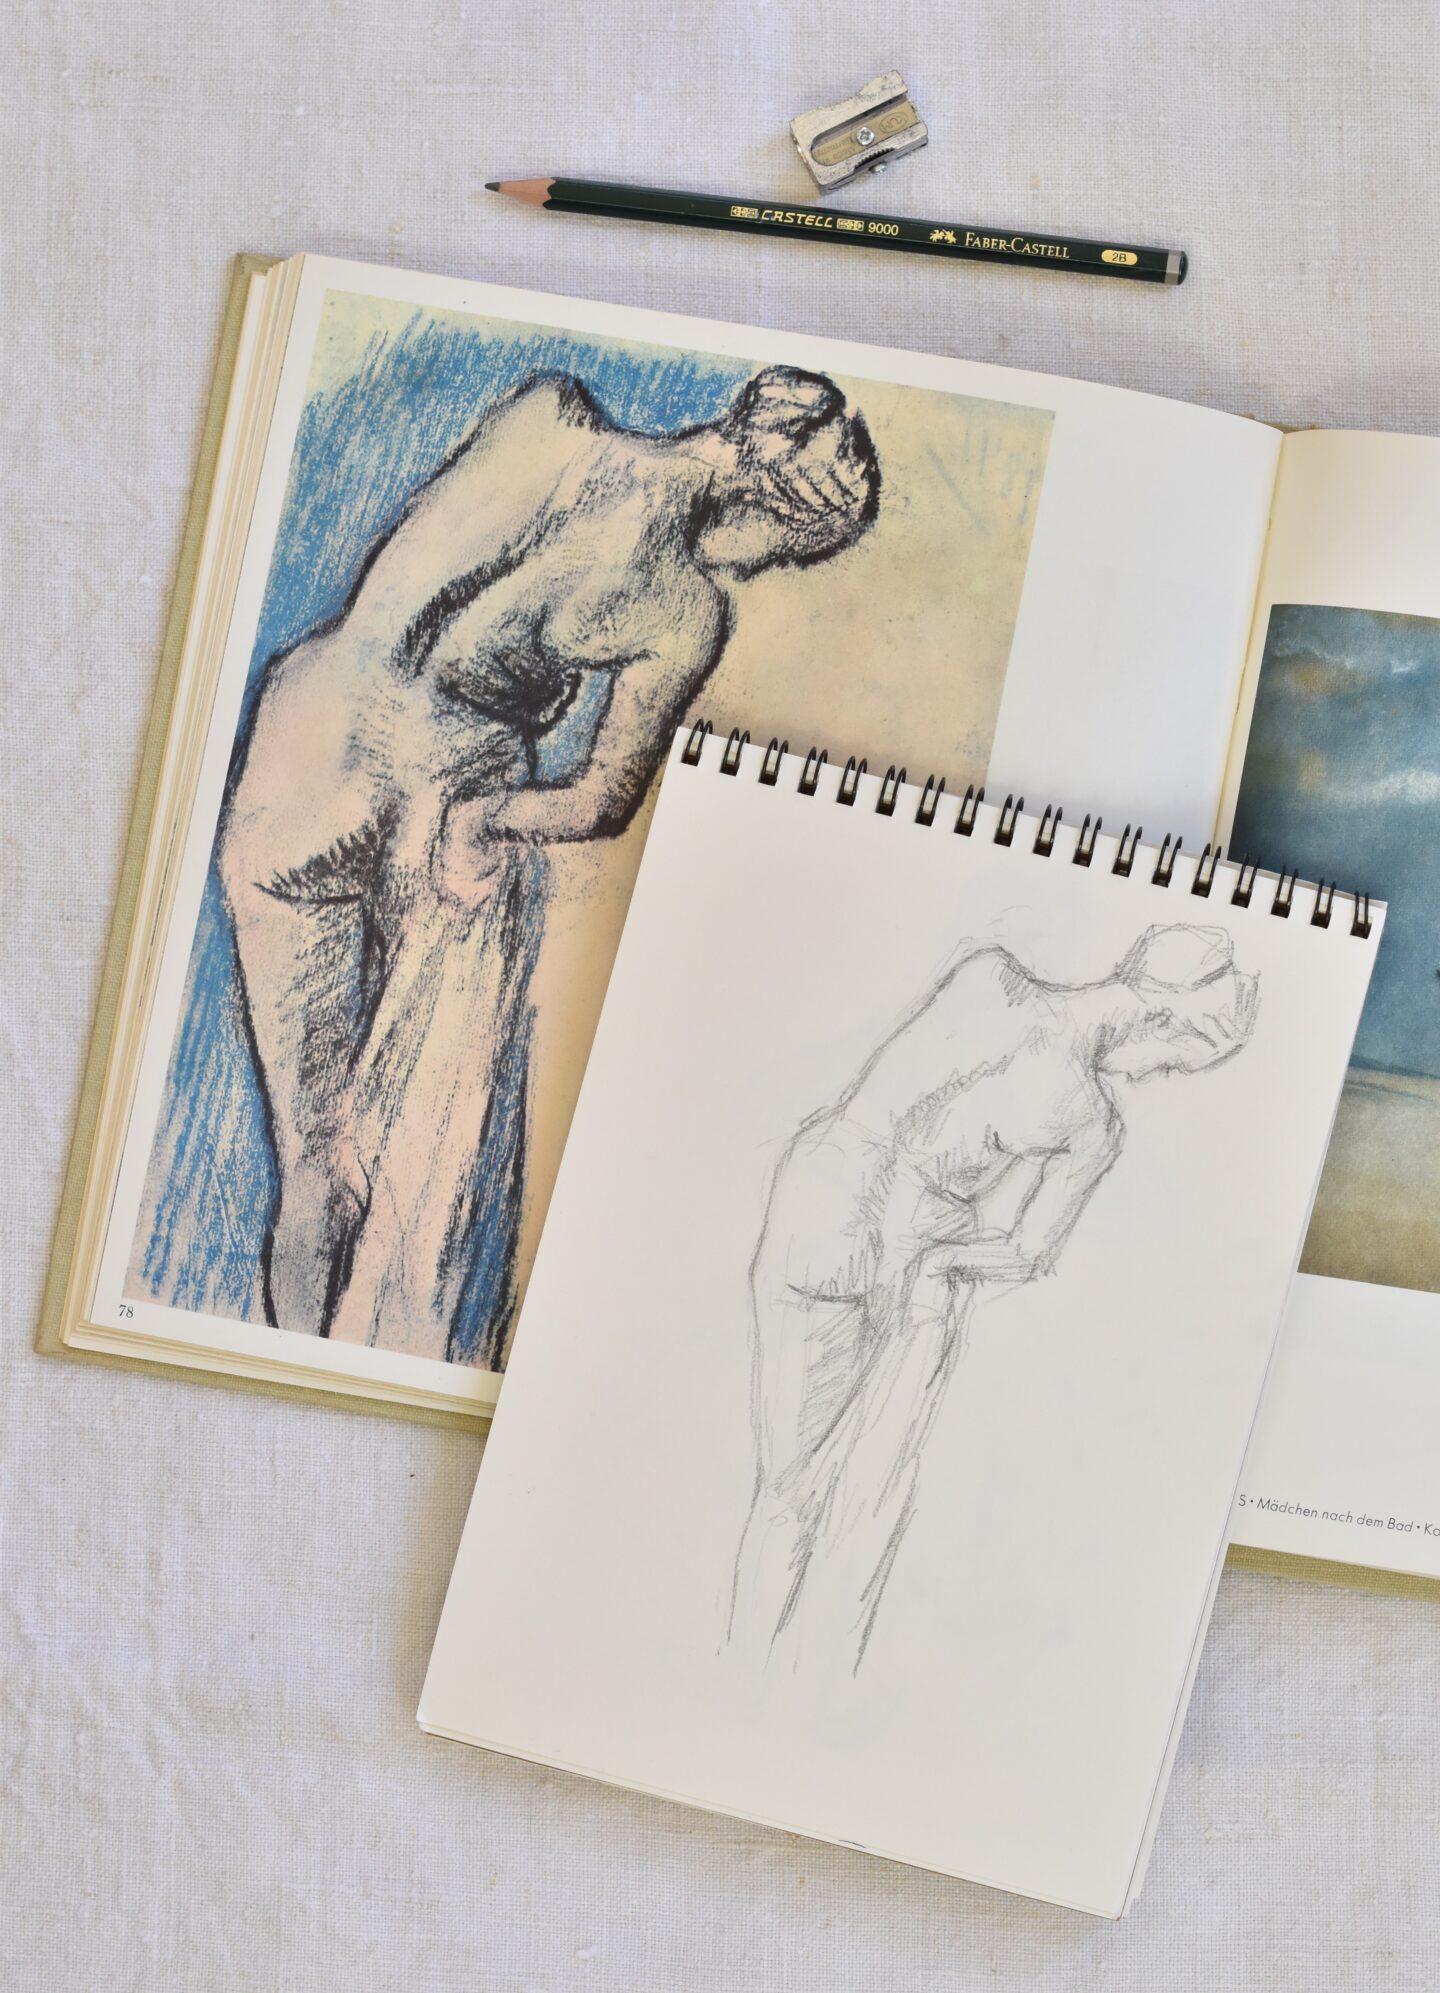 Copy of an Edgar Degas drawing